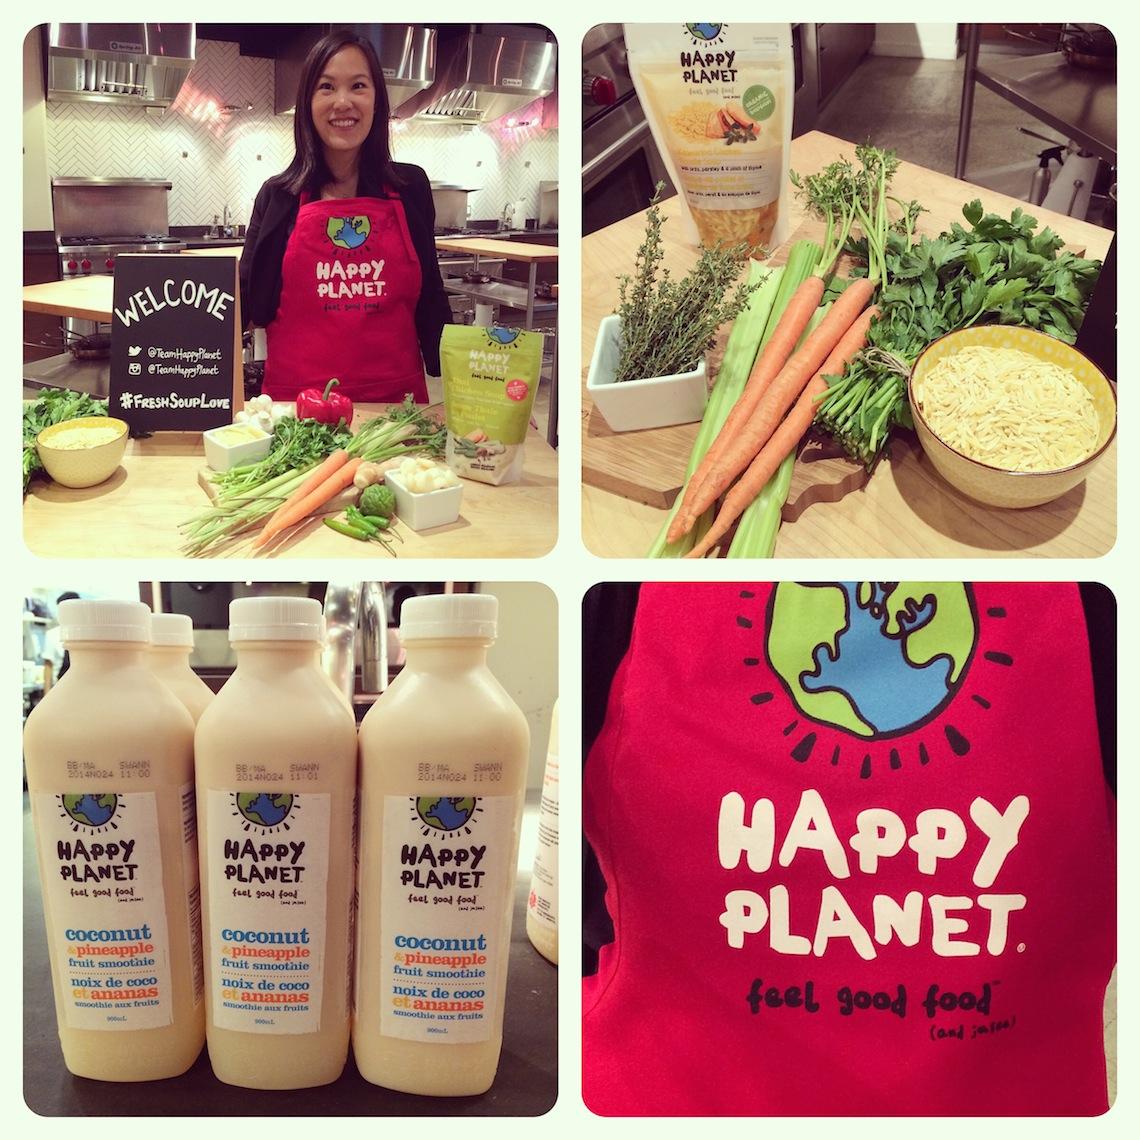 happy planet fresh soup love